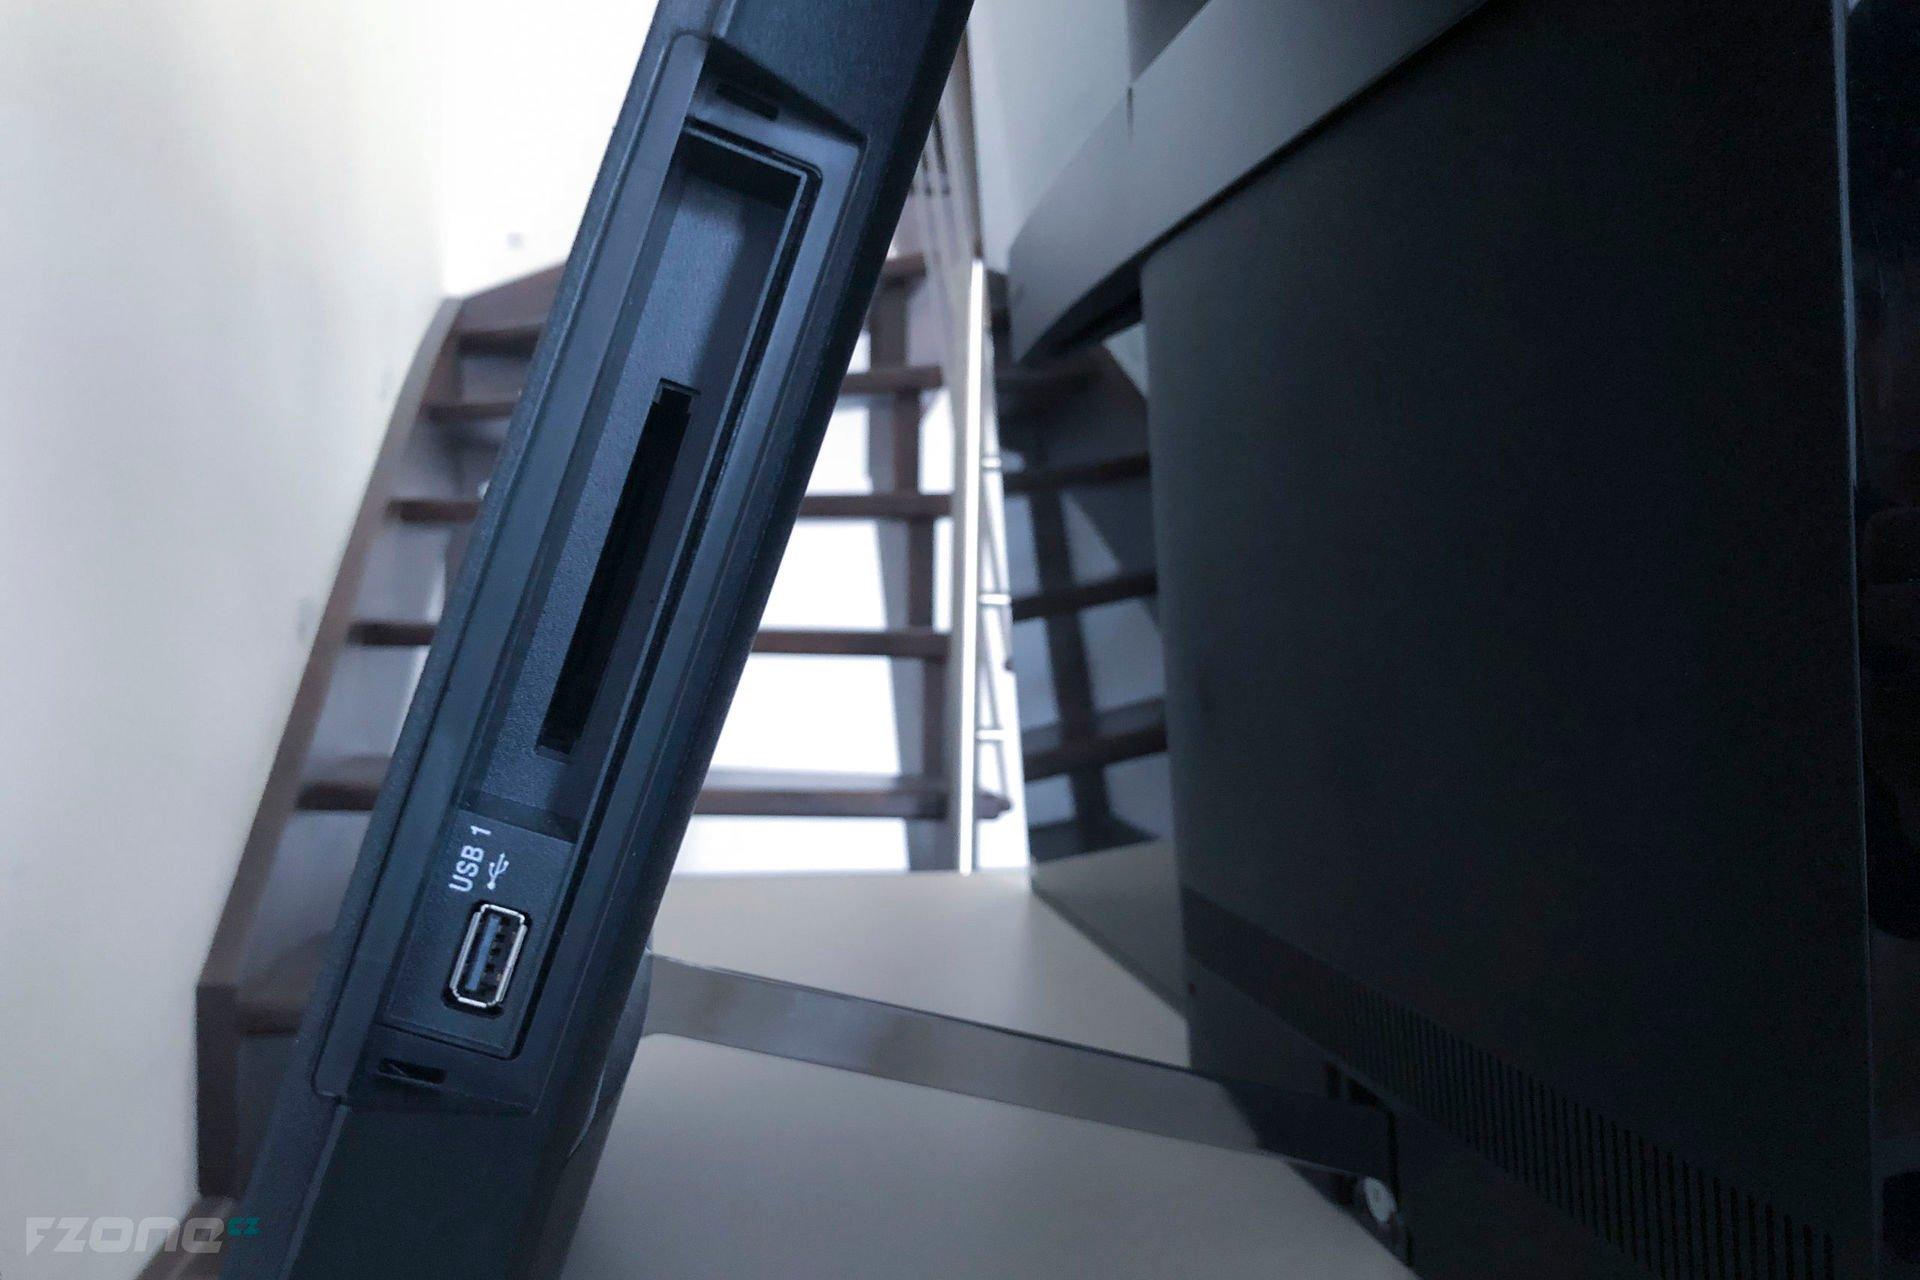 Sony KD-55A1 OLED